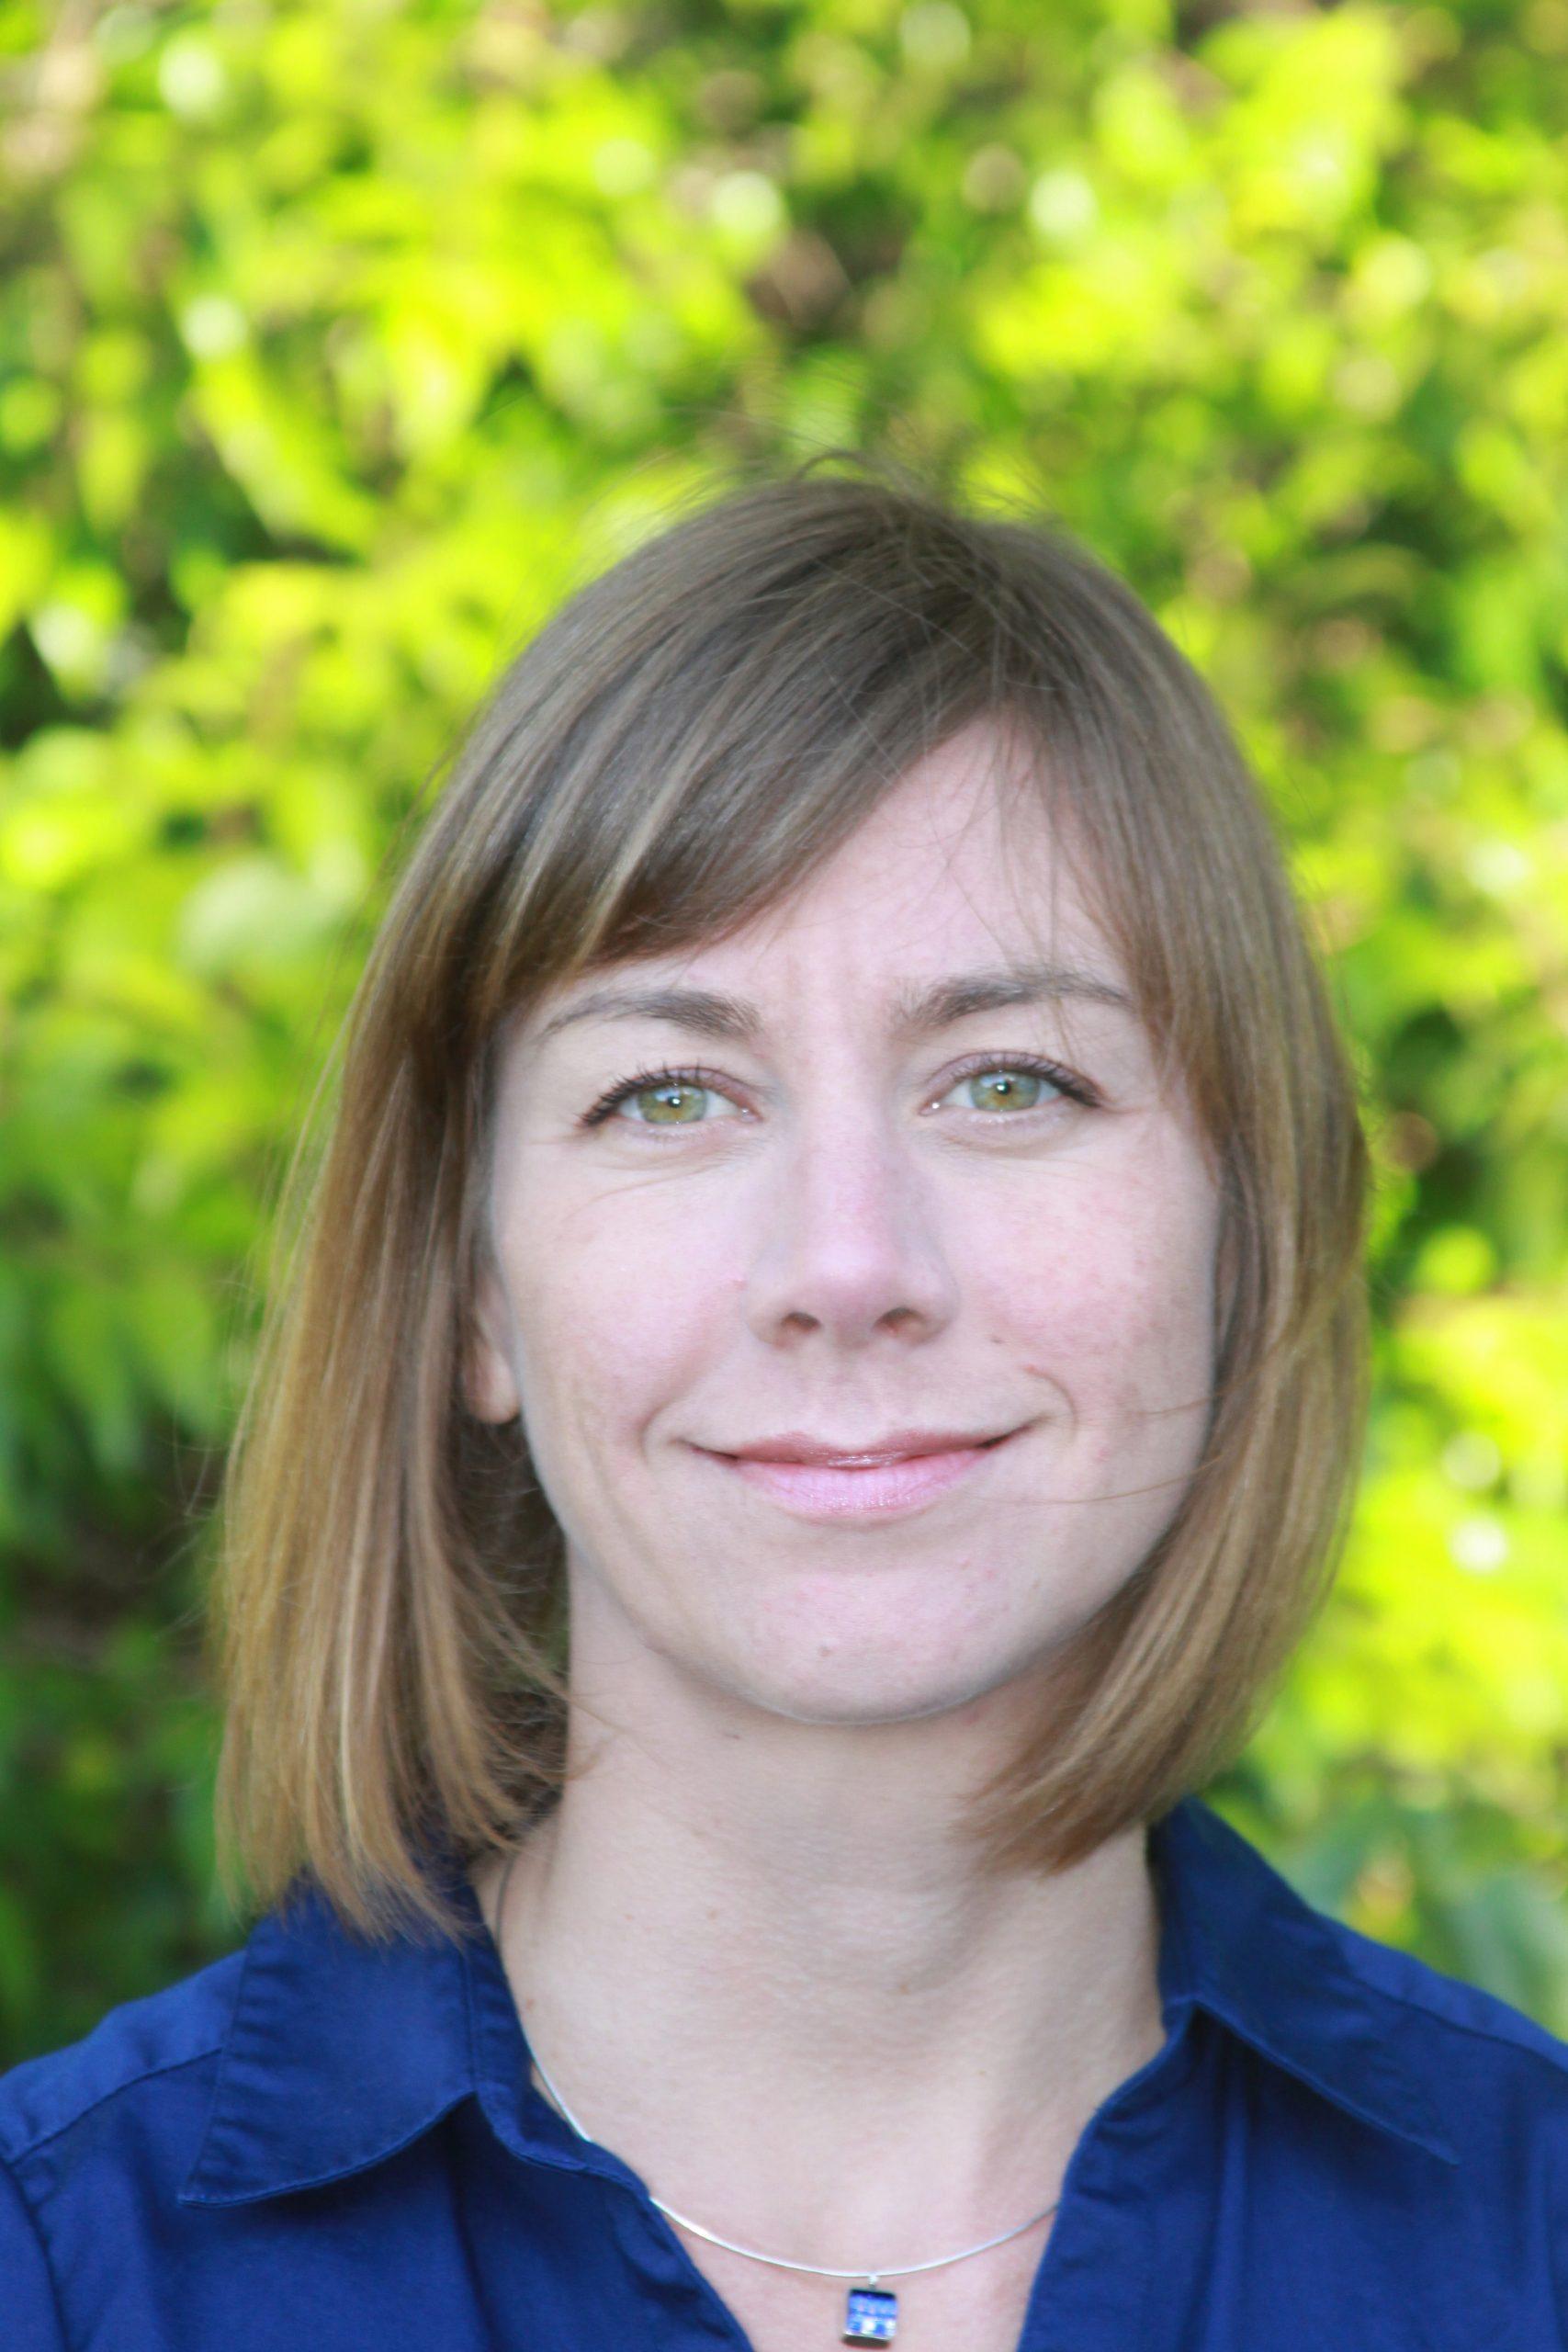 Megan Williams, assistant professor of neurobiology and anatomy, has won a prestigious Sloan Research Fellowship.